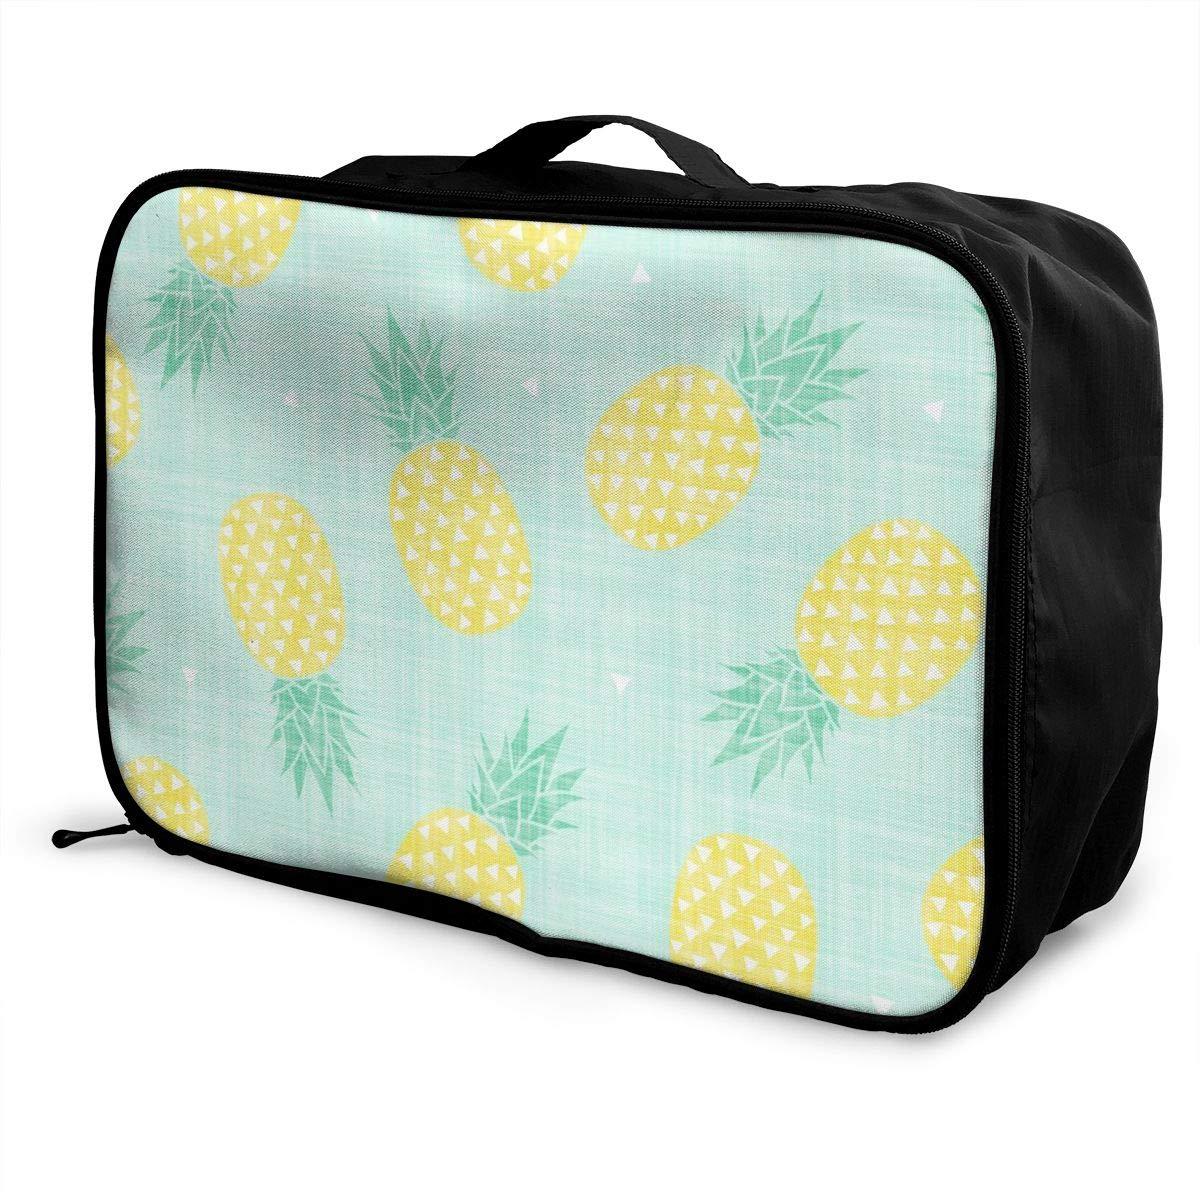 Travel Duffle Bag Pineapple Weekender Bag Waterproof Foldable Nylon Luggage Duffel Bag For Sports Vacation Hand Bag In Trolley Handle Gym Hiking